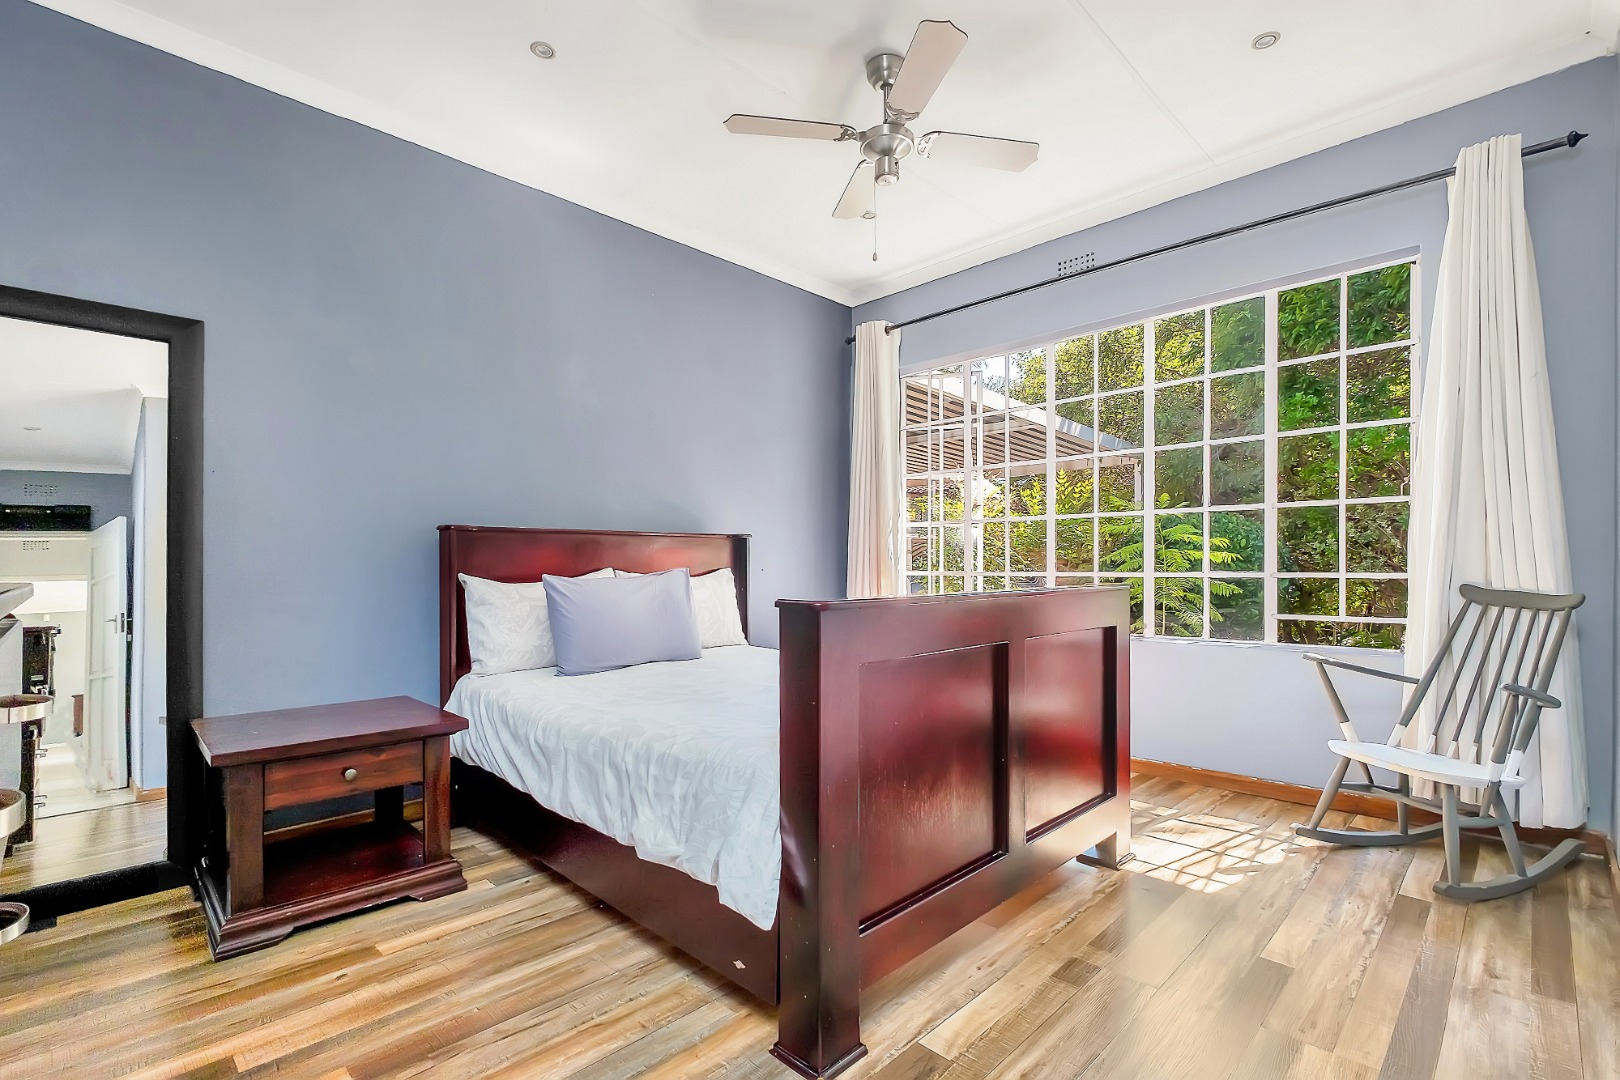 5 Bedroom House For Sale in Jukskei Park